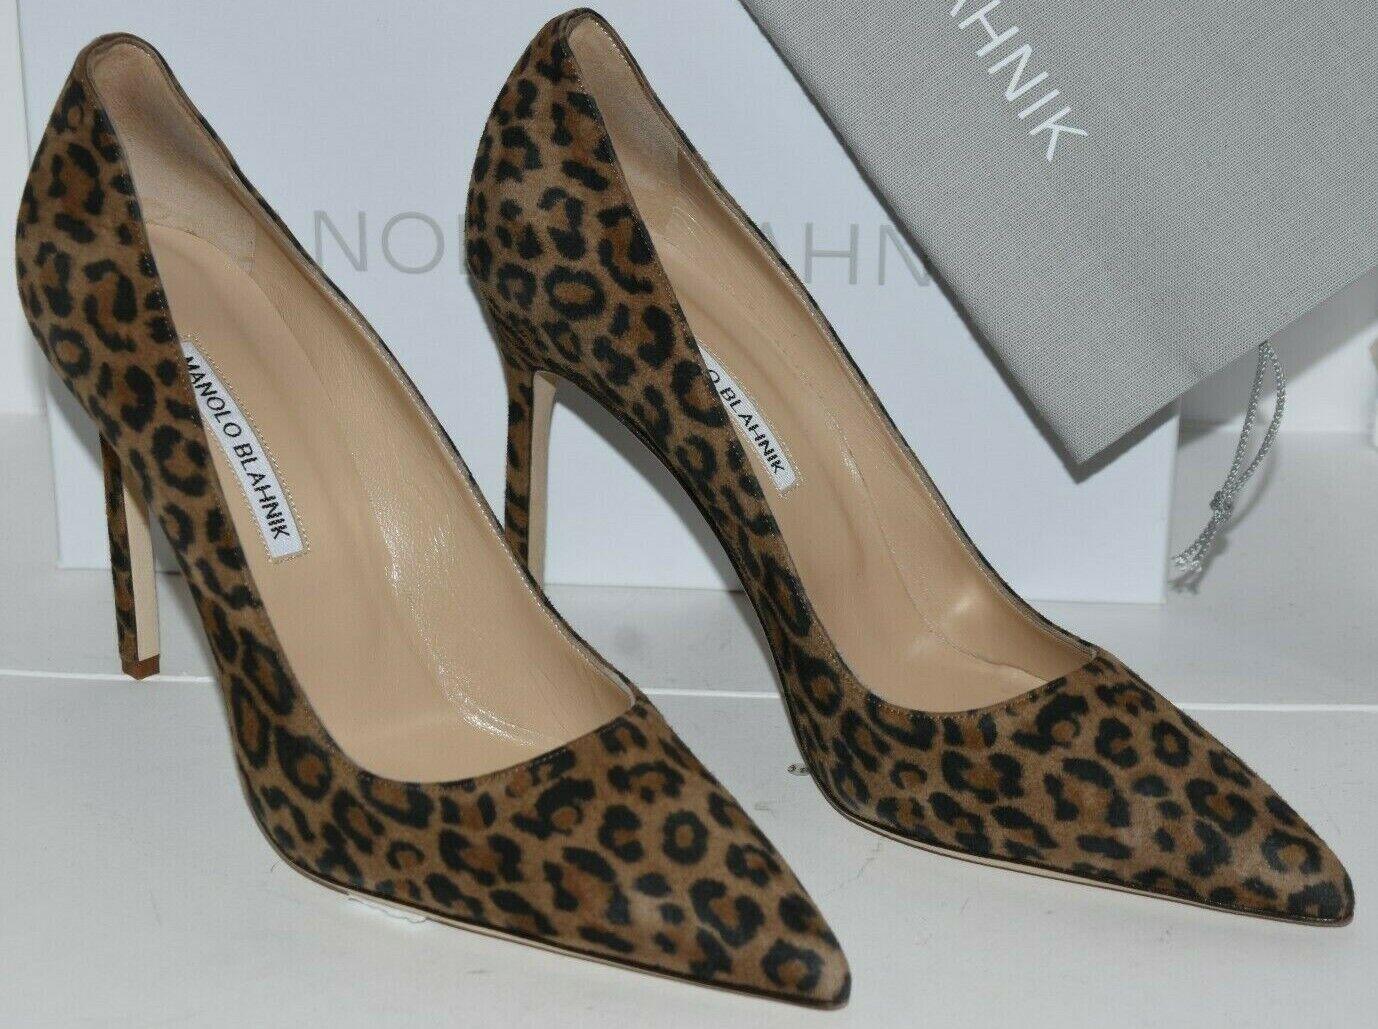 695 NEW Manolo Blahnik BB 105 Leopard Pumps Suede Beige Brown shoes  40 40.5